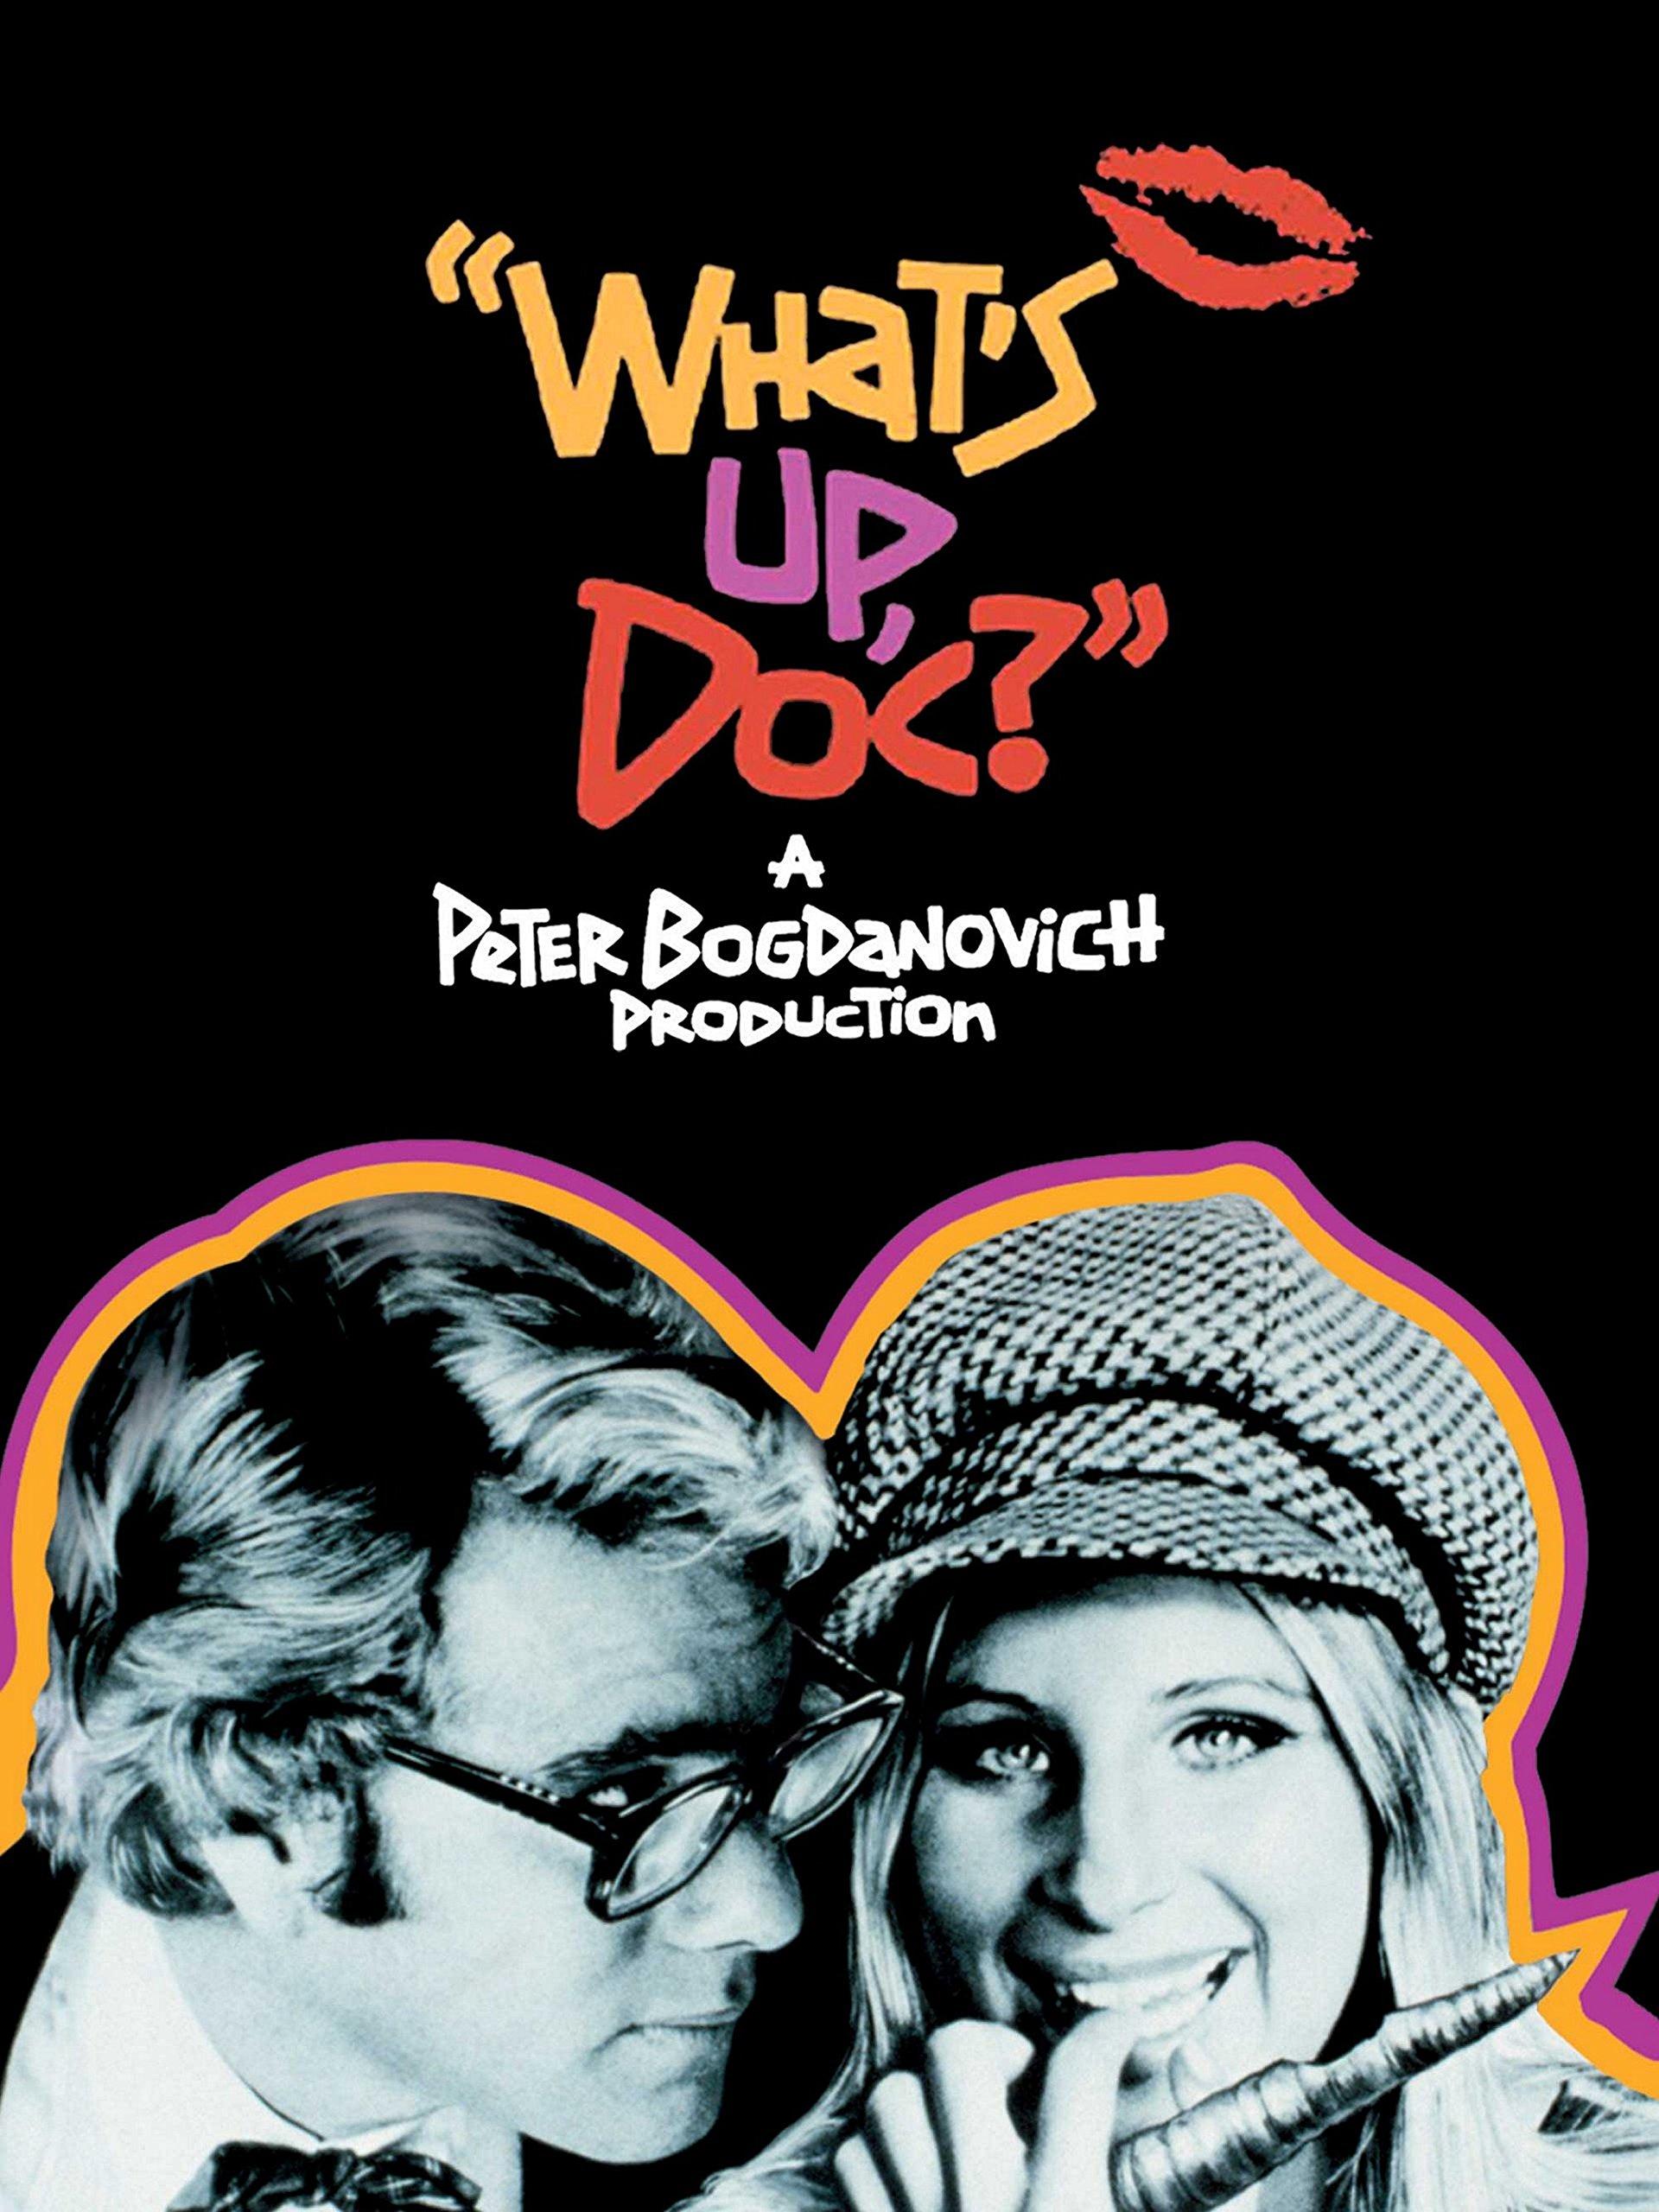 Mi van, doki? (1972)